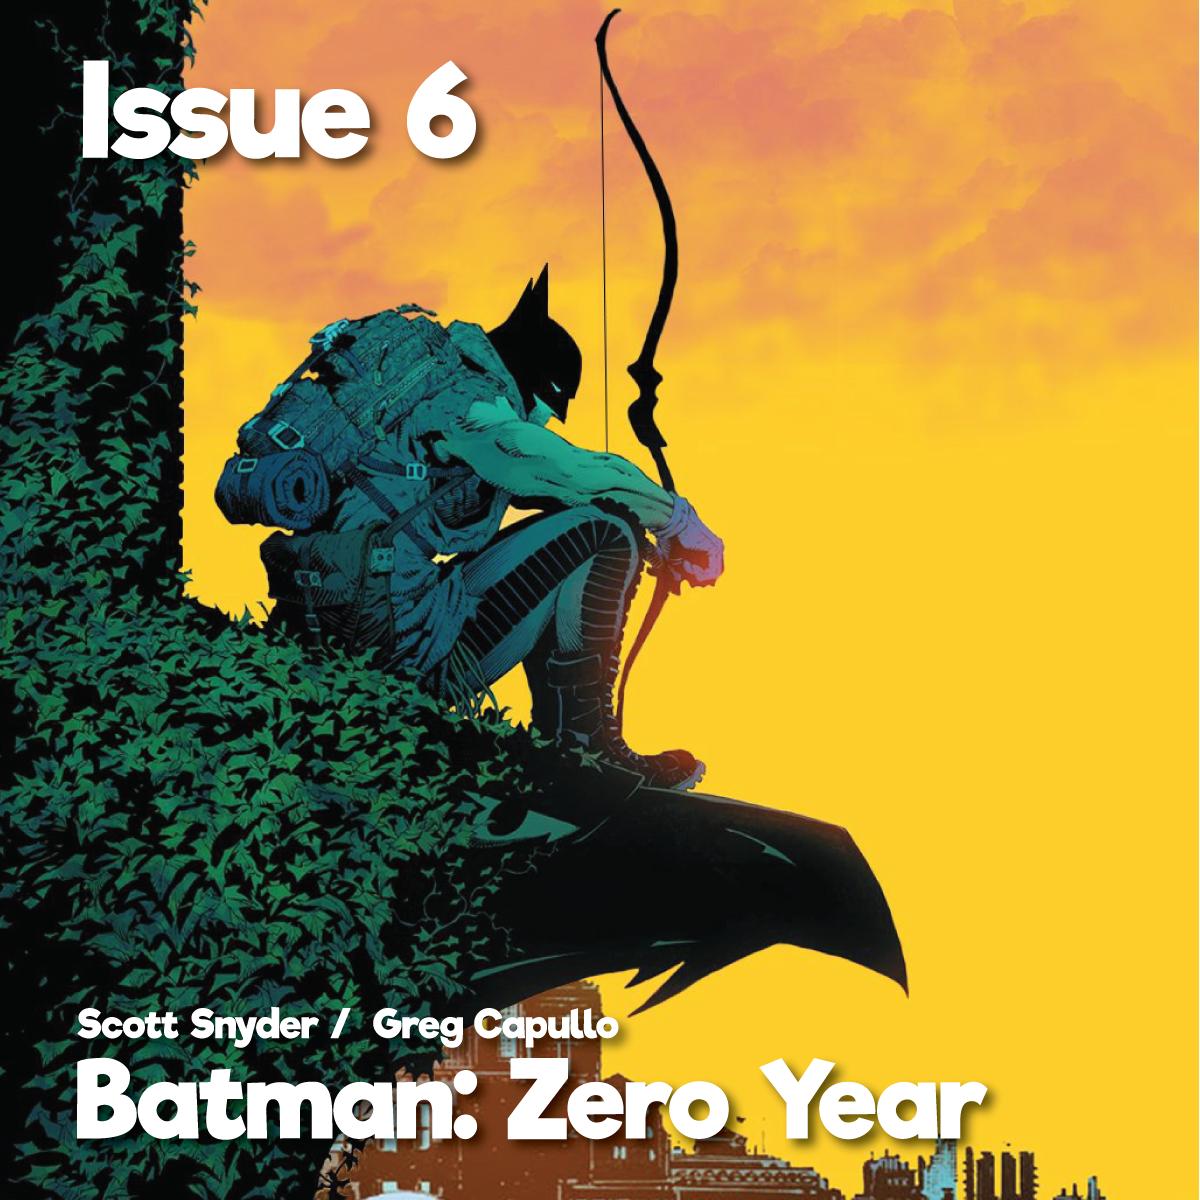 Issue6_Batman_ZeroYear1200x1200.png